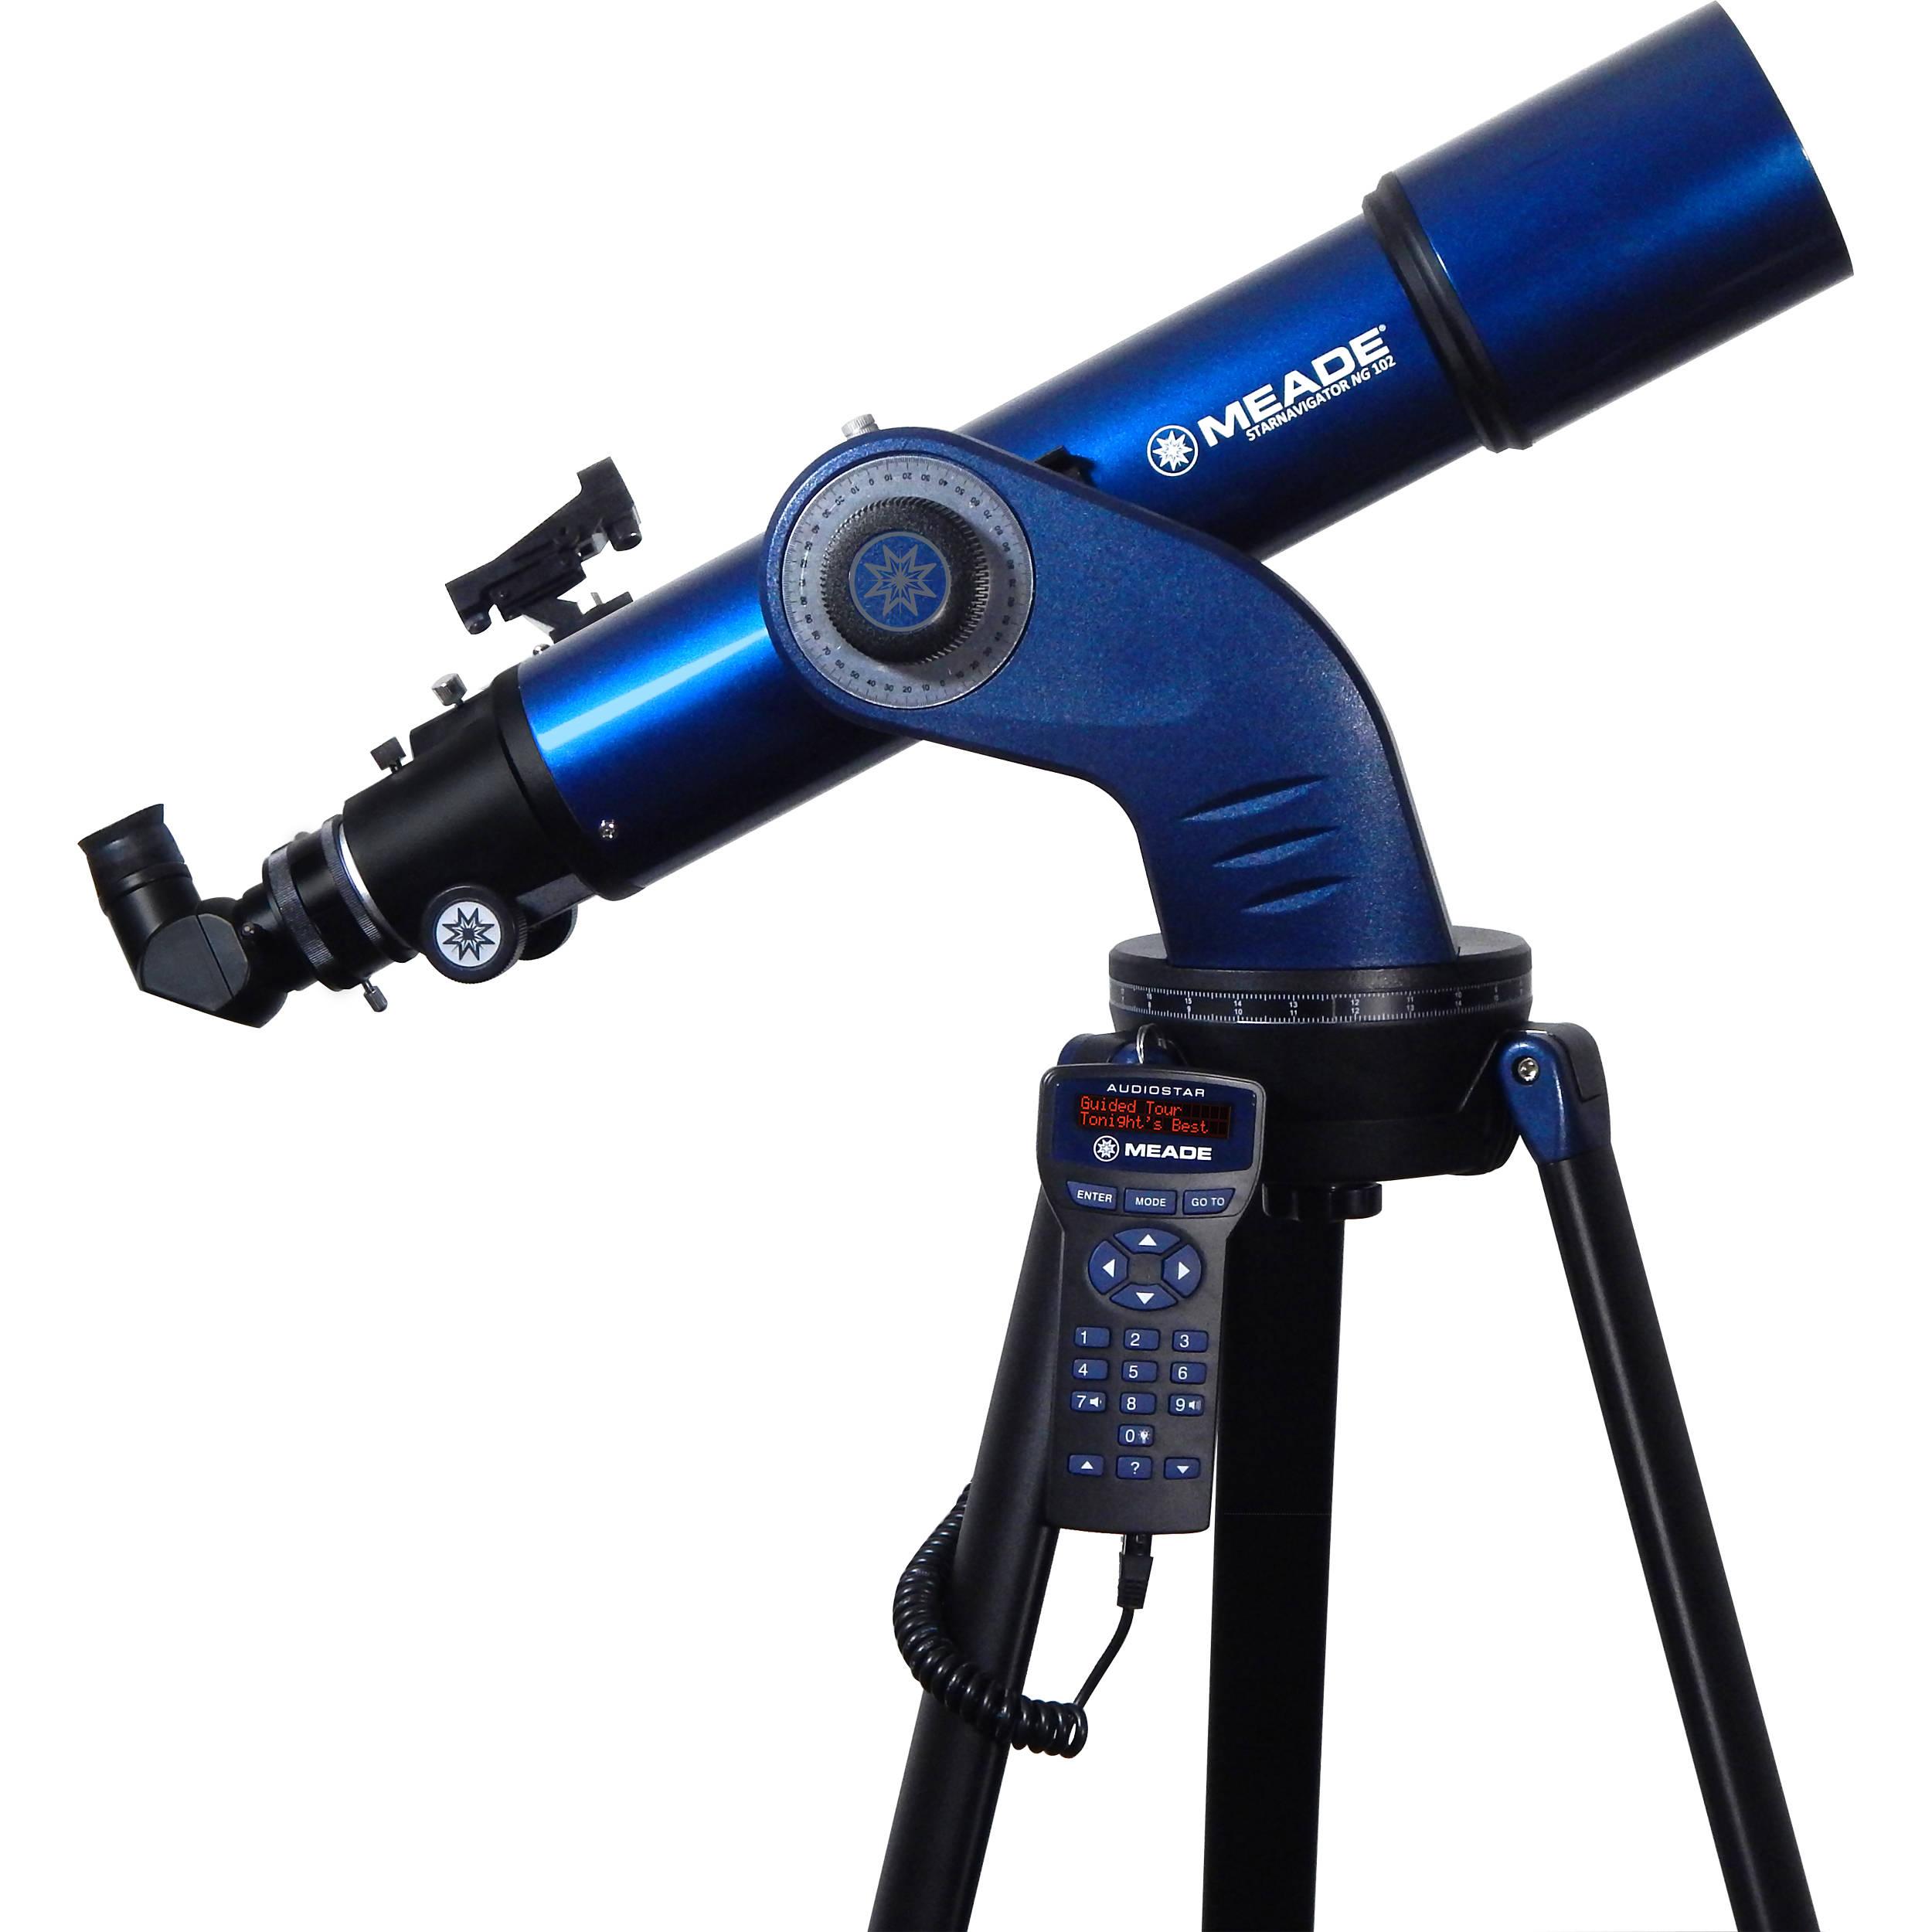 Cameras & Photo Binoculars & Telescopes Meade Instruments Classic 30 Photo Tripod Photo Tripod A Great Variety Of Models